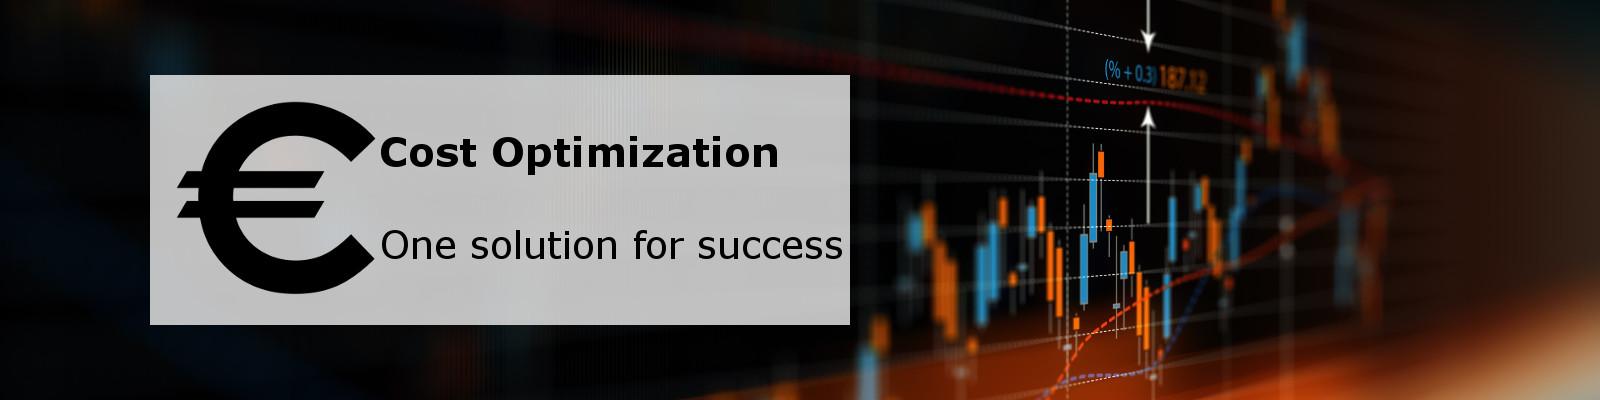 CostOptimization_Banner